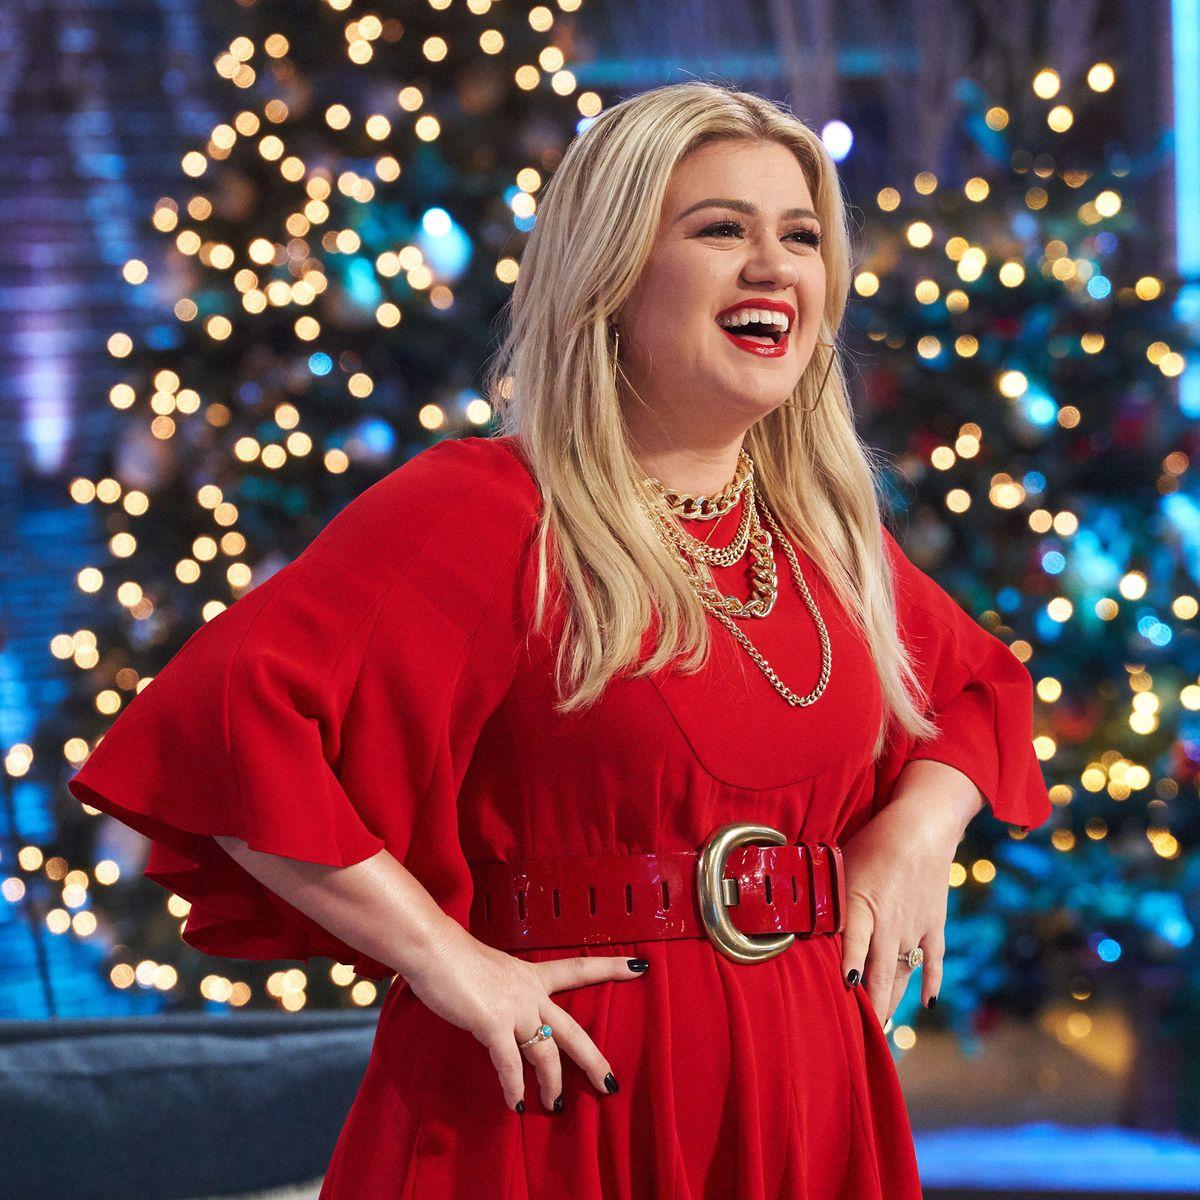 Kelly Clarkson Drops New Christmas Song Under The Mistletoe